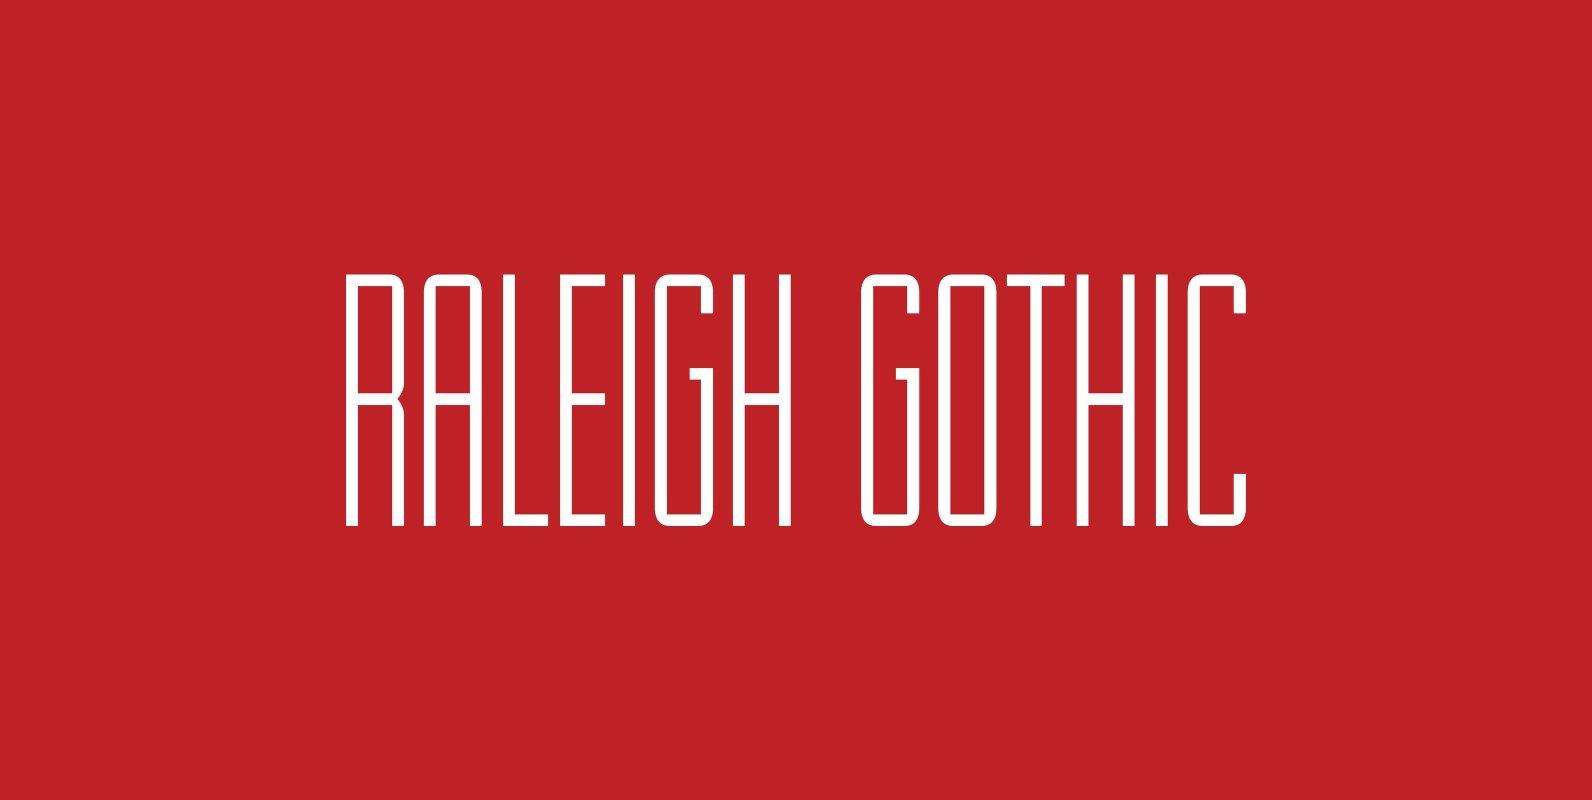 Raleigh Gothic